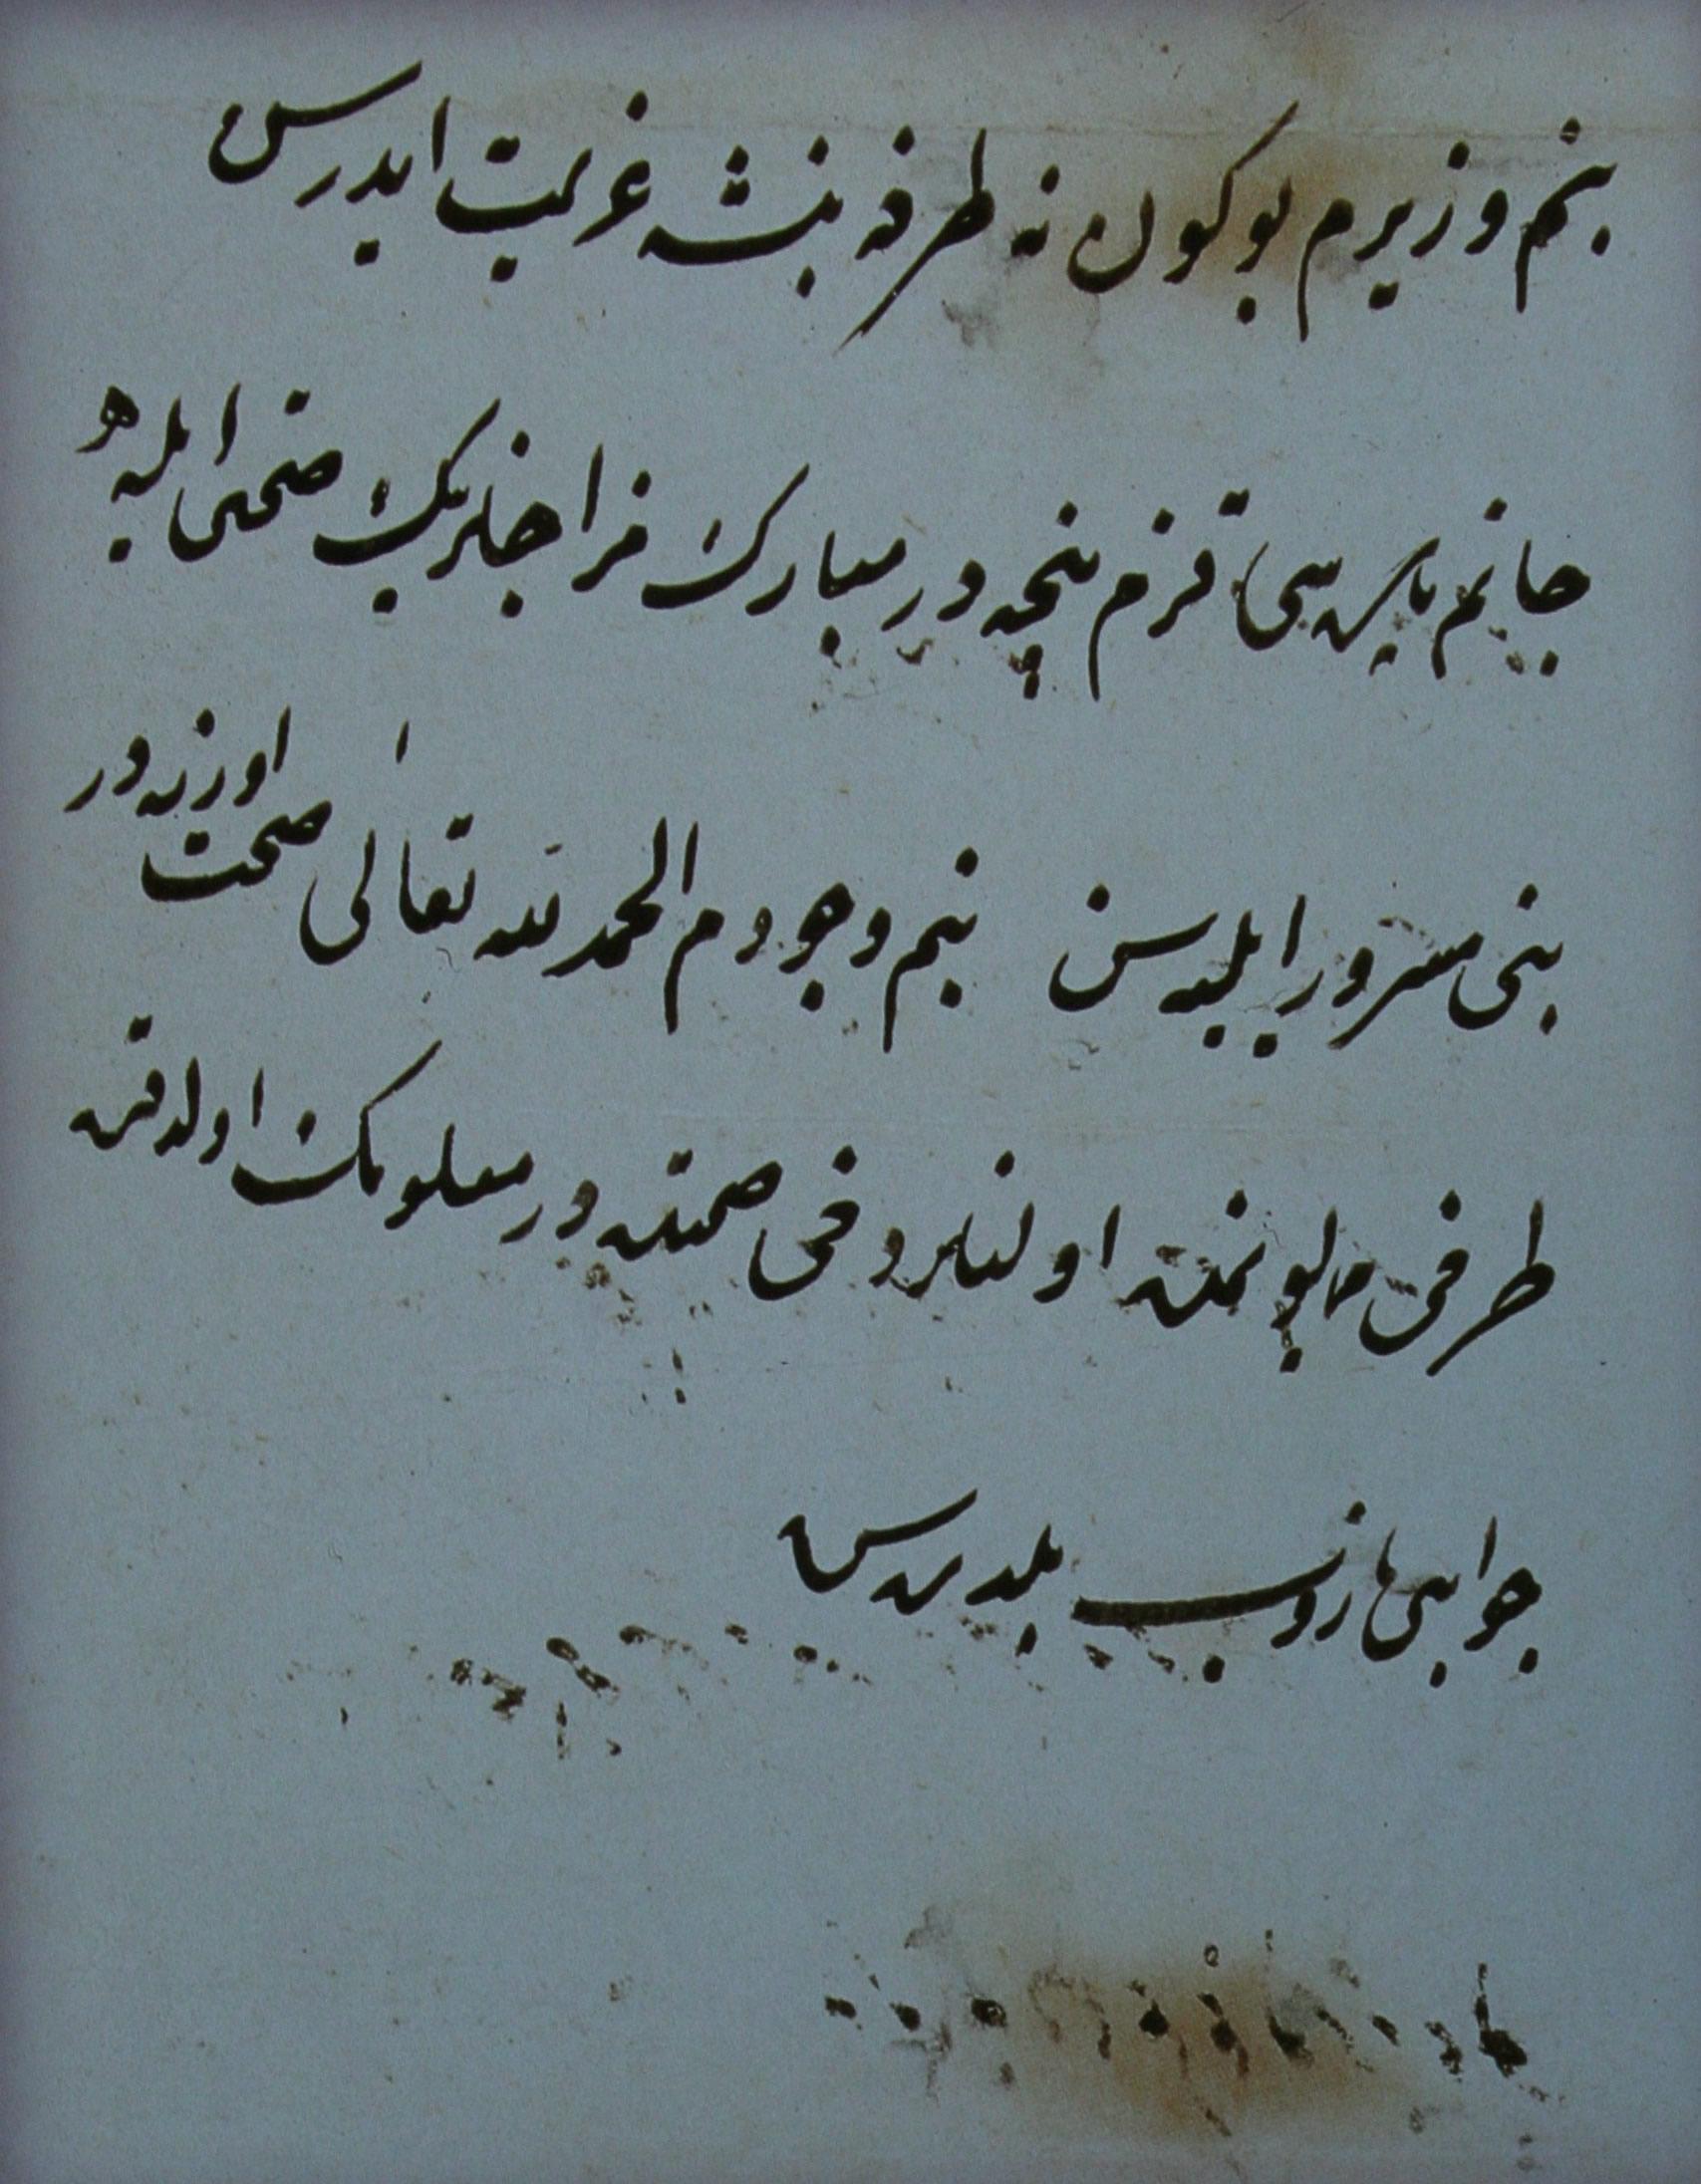 Ottoman Reform Edict Of 1856